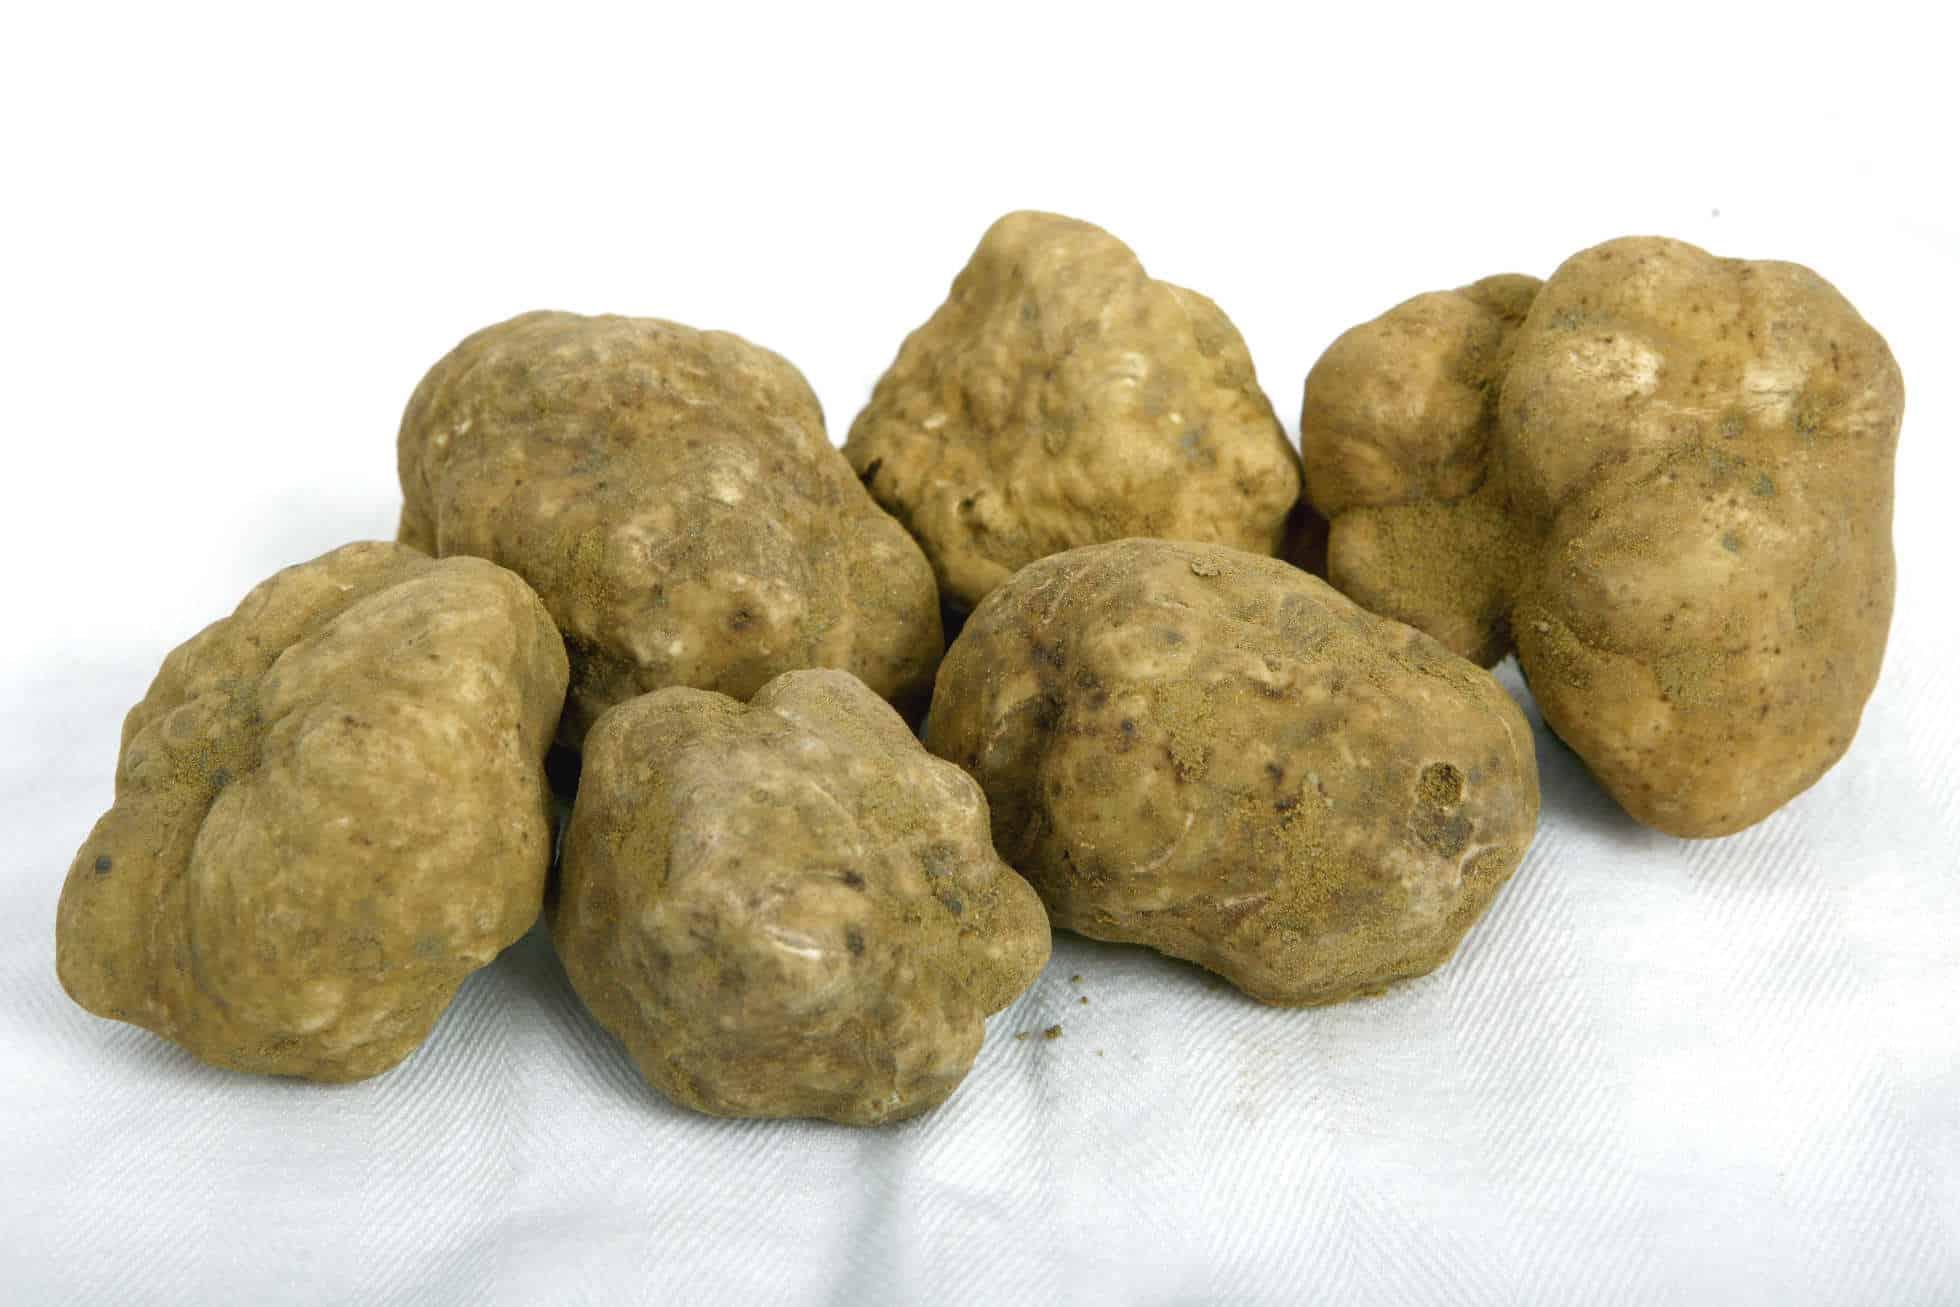 tartufi-bianchi-20-70.jpg-truffes-blanches-dALBA.jpg